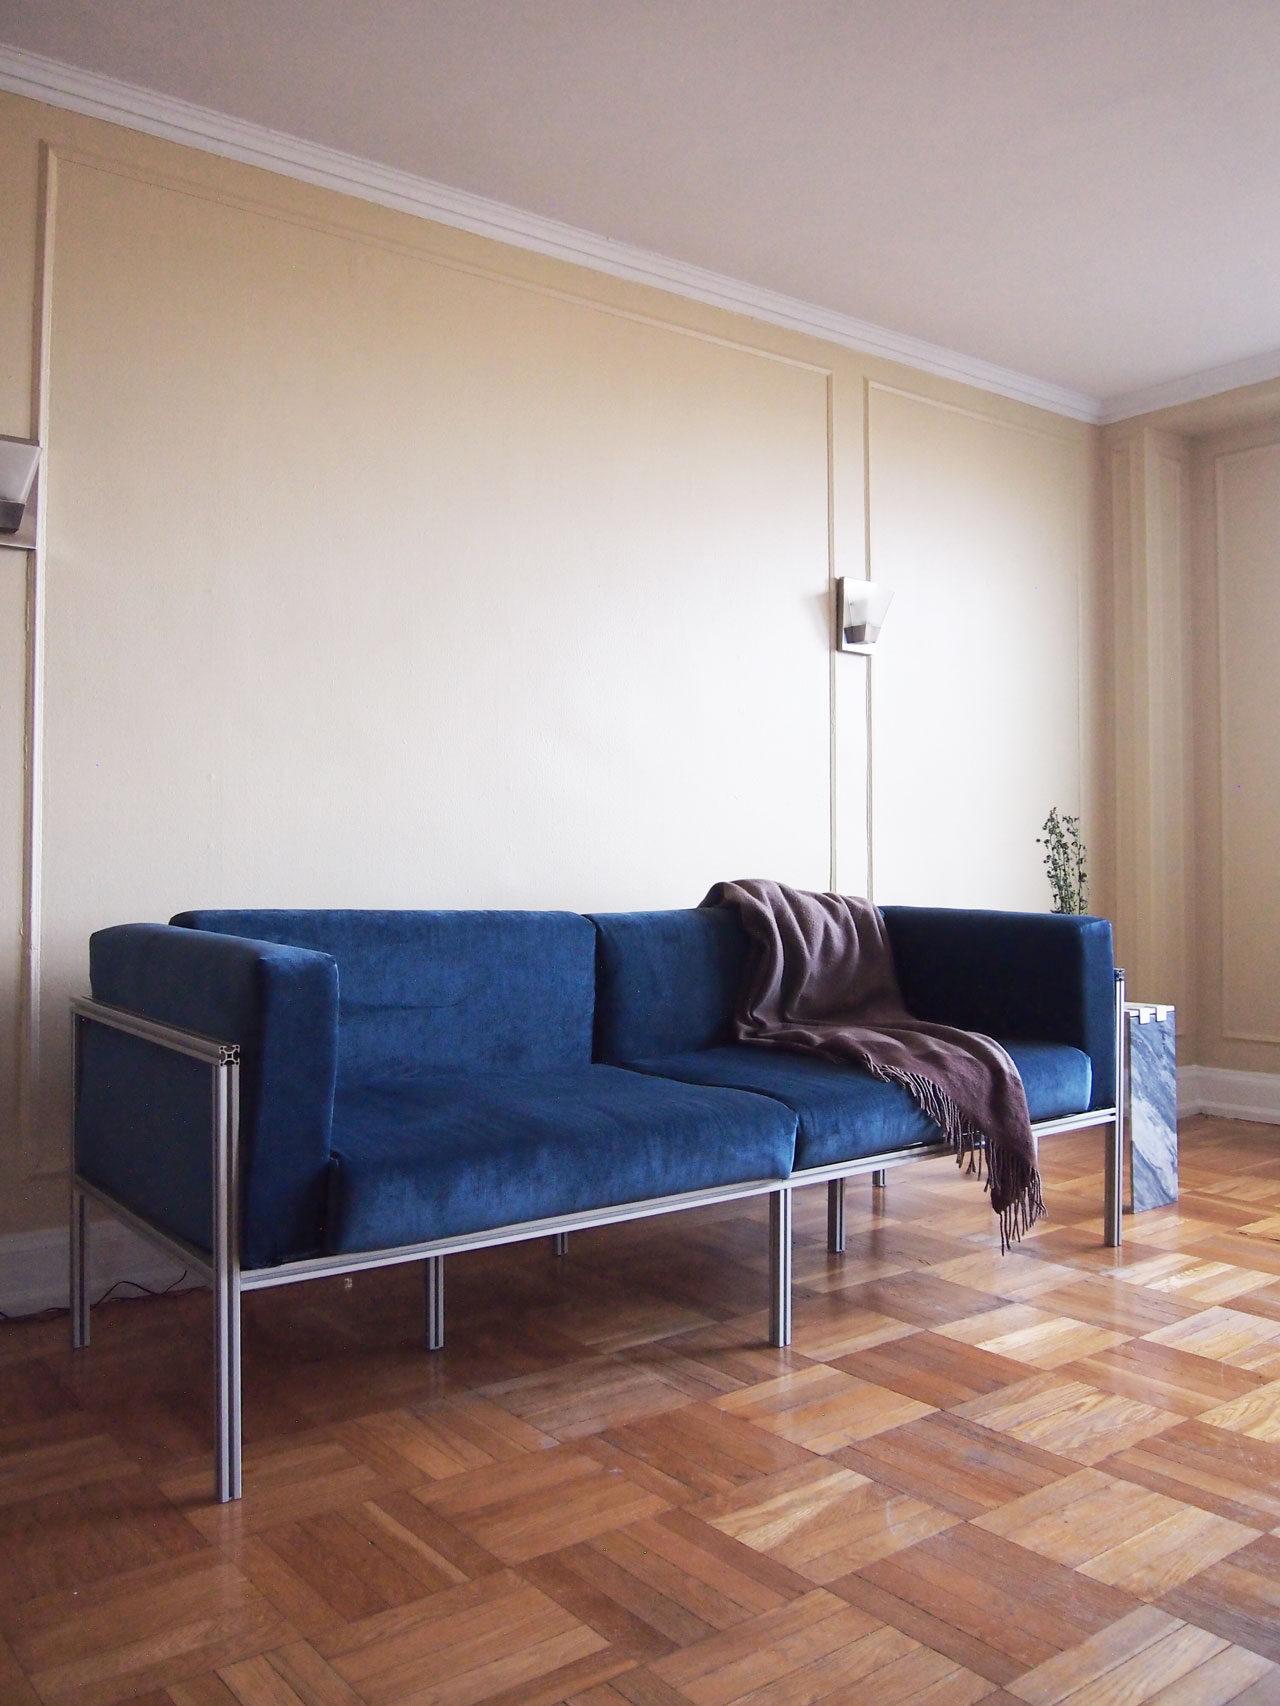 DIY velvet sofa couch designed by Aandersson